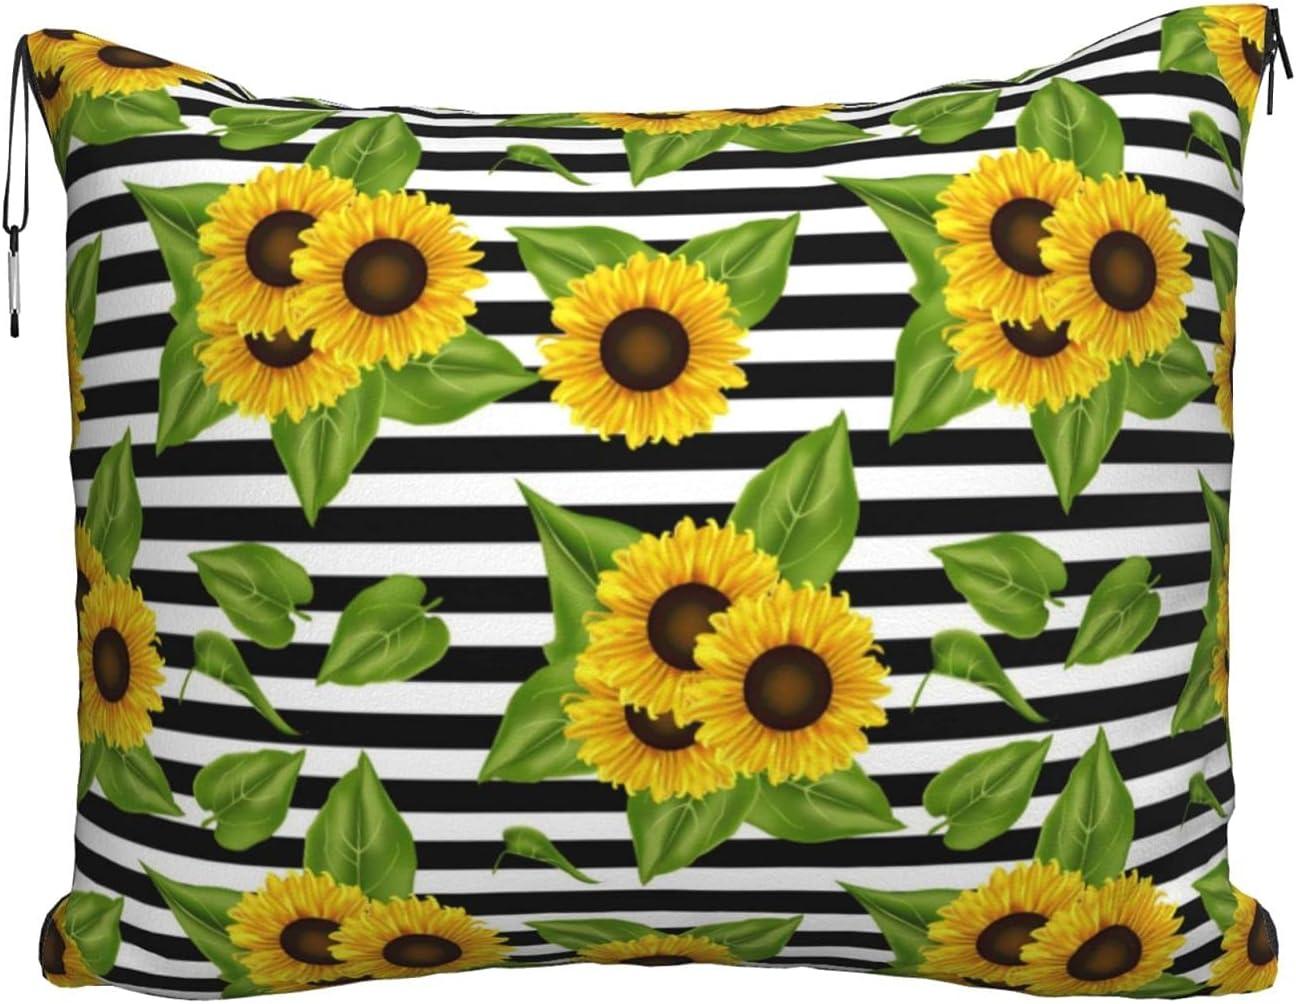 Sunflower Premium Popular standard Max 48% OFF Soft Travel Blanket Airplane Ca Combo